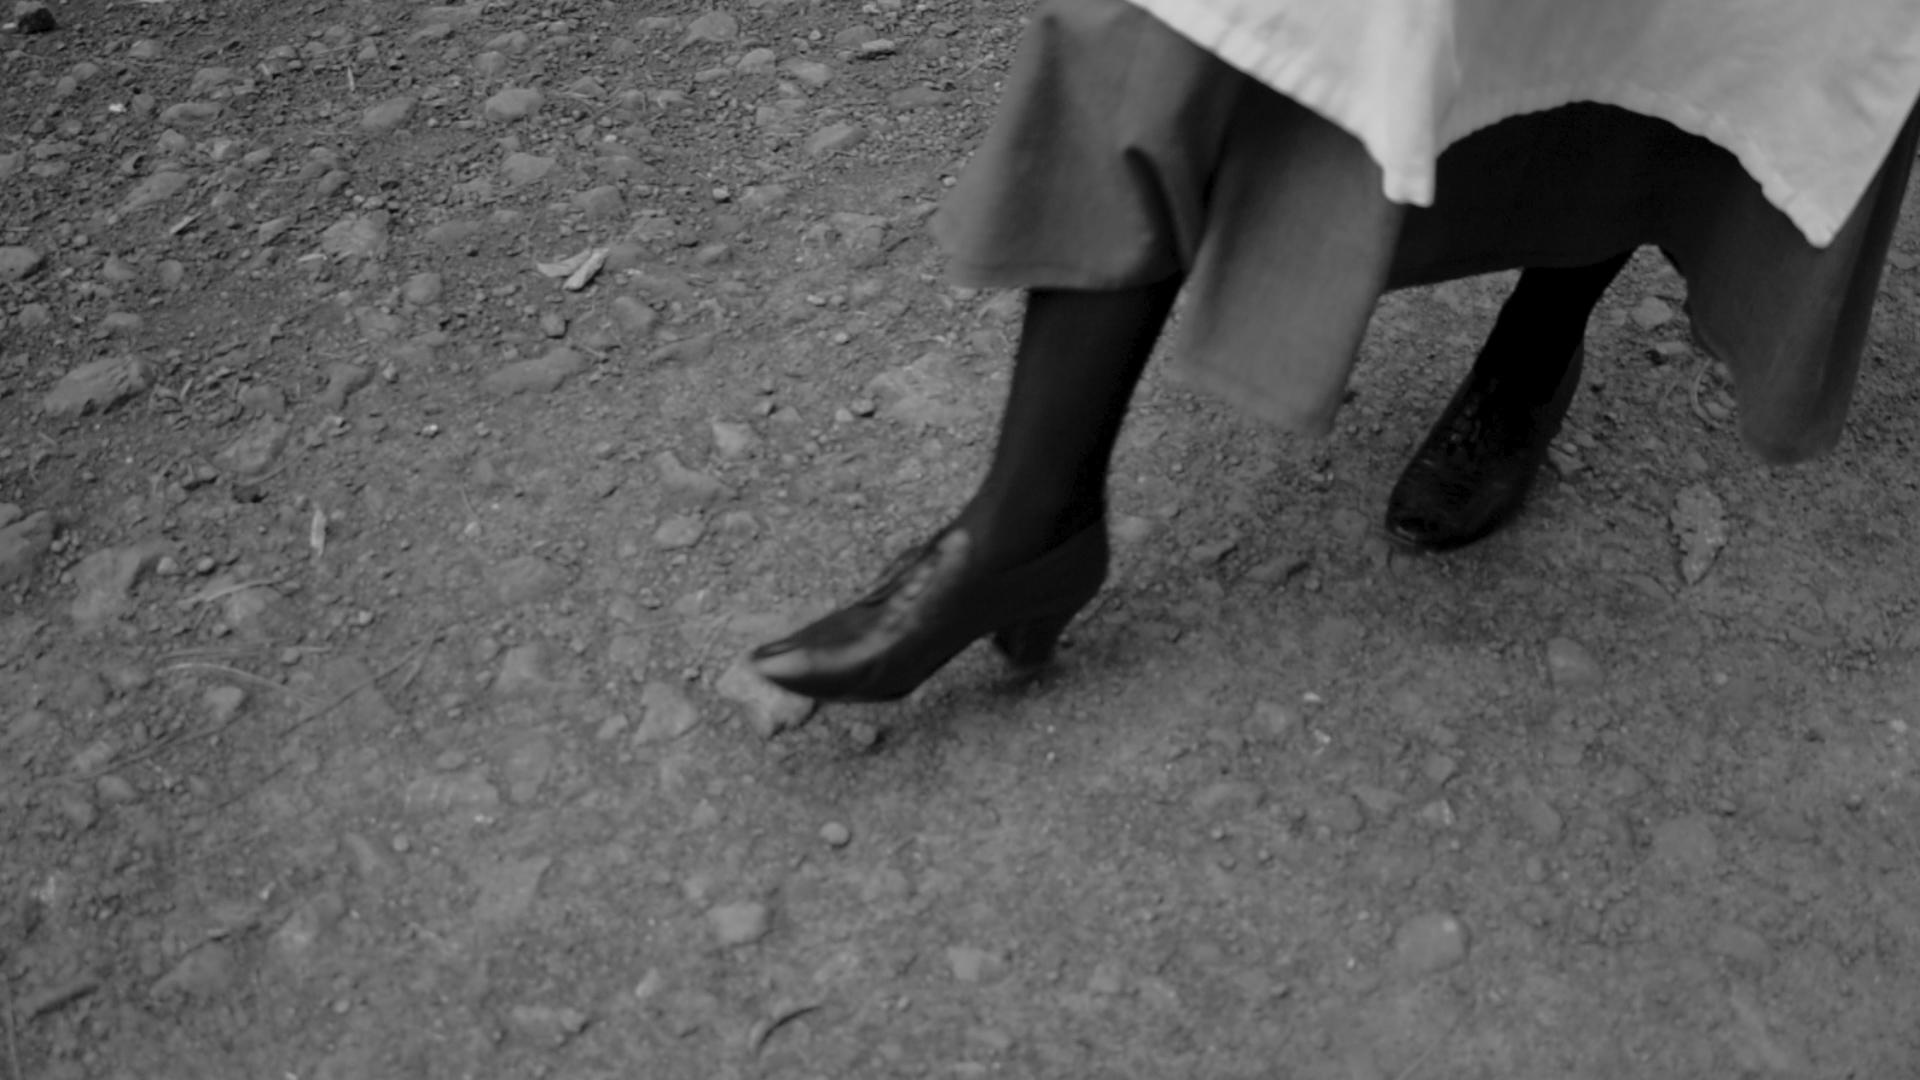 Feet original on path